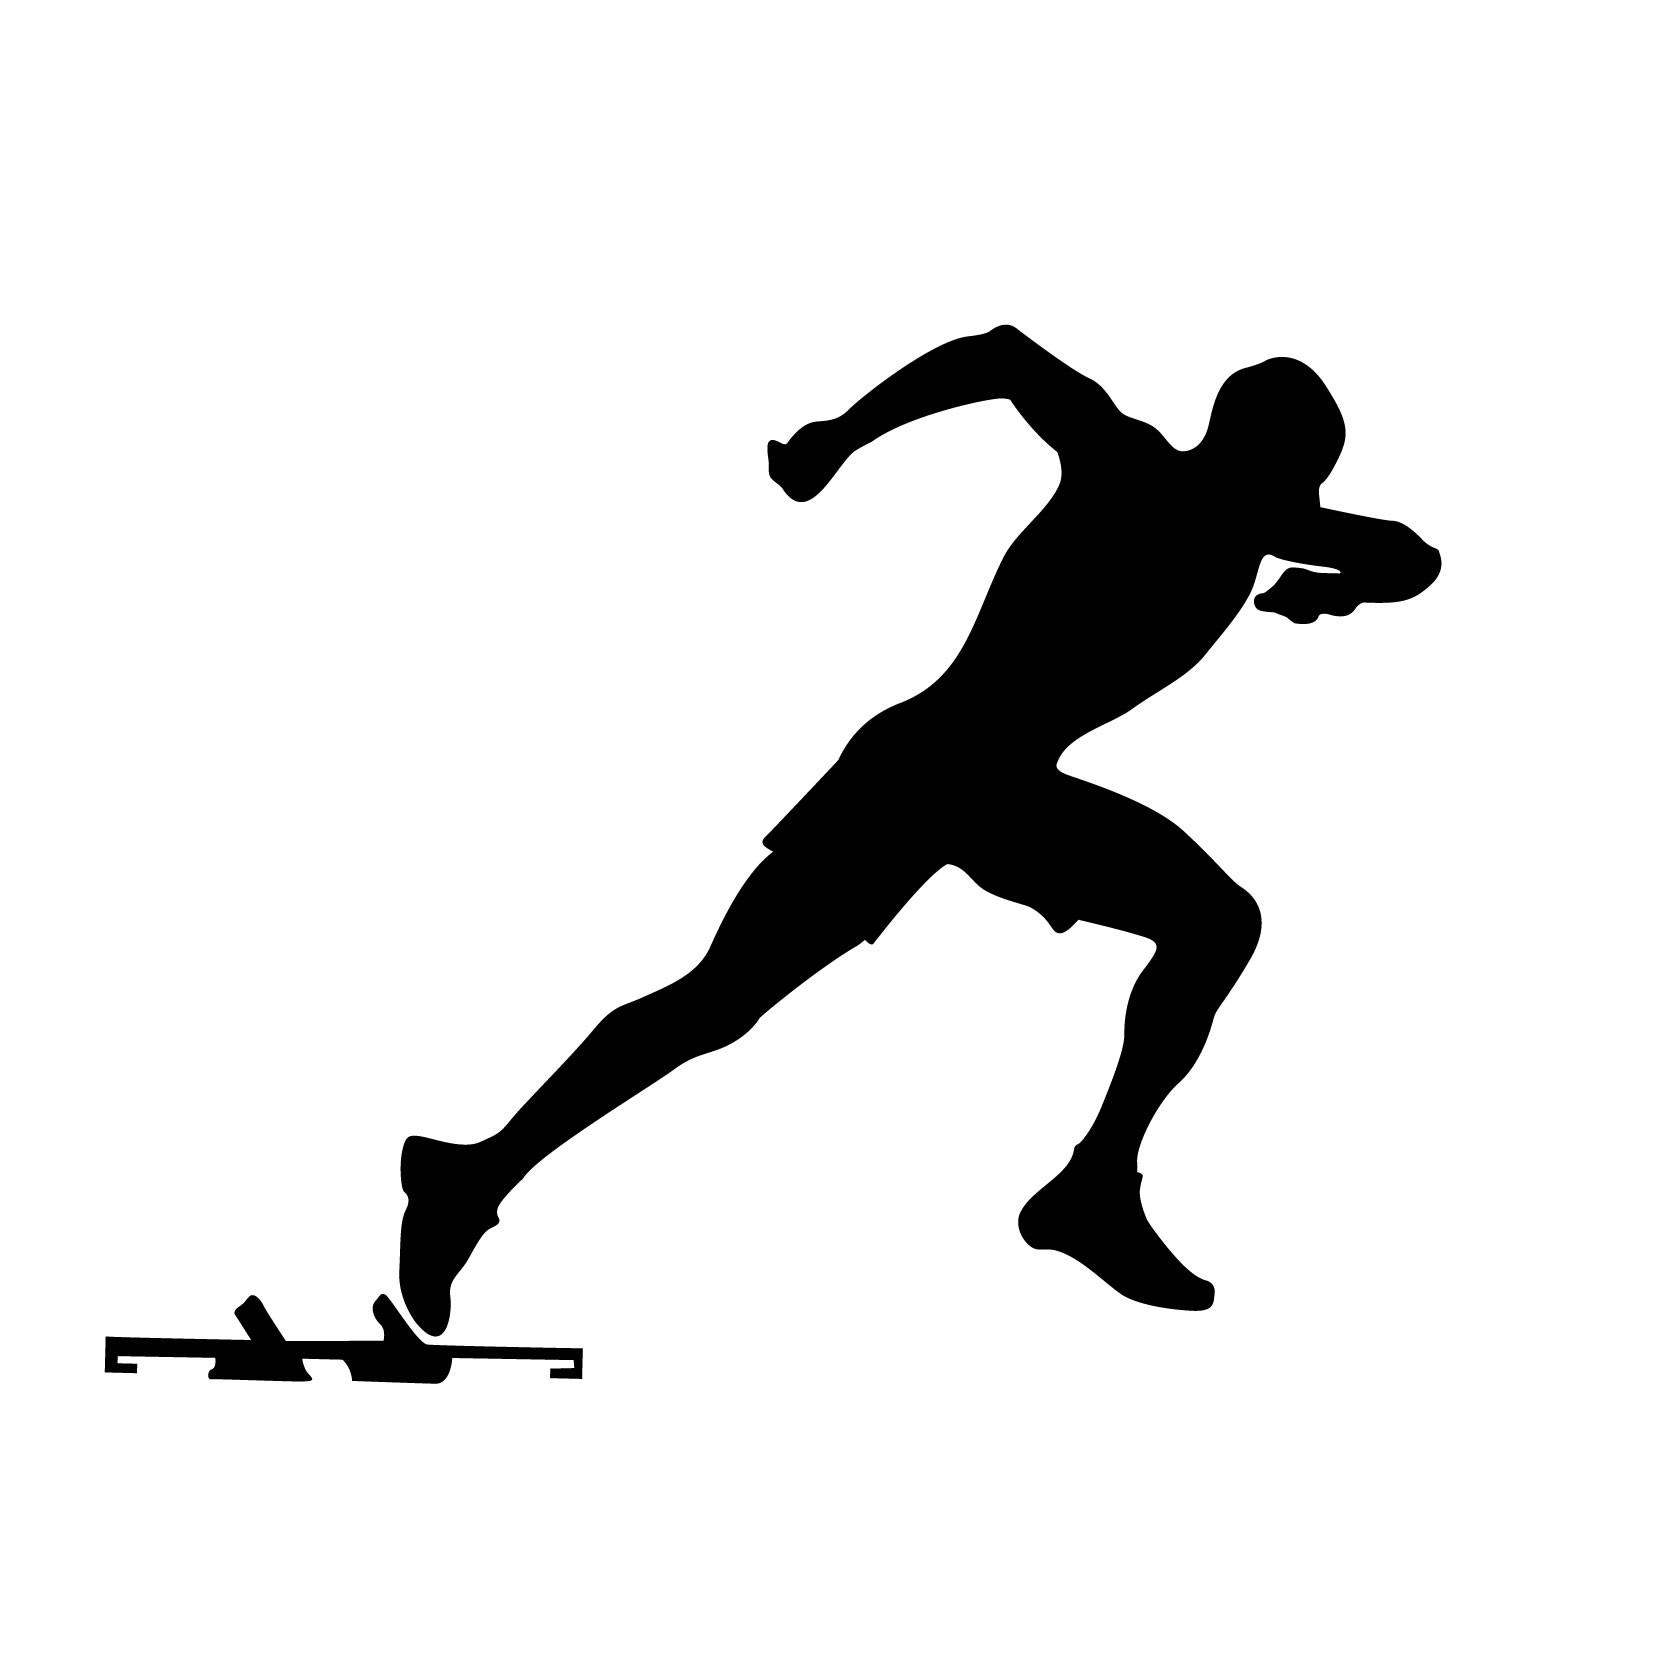 Track silhouette clipart.